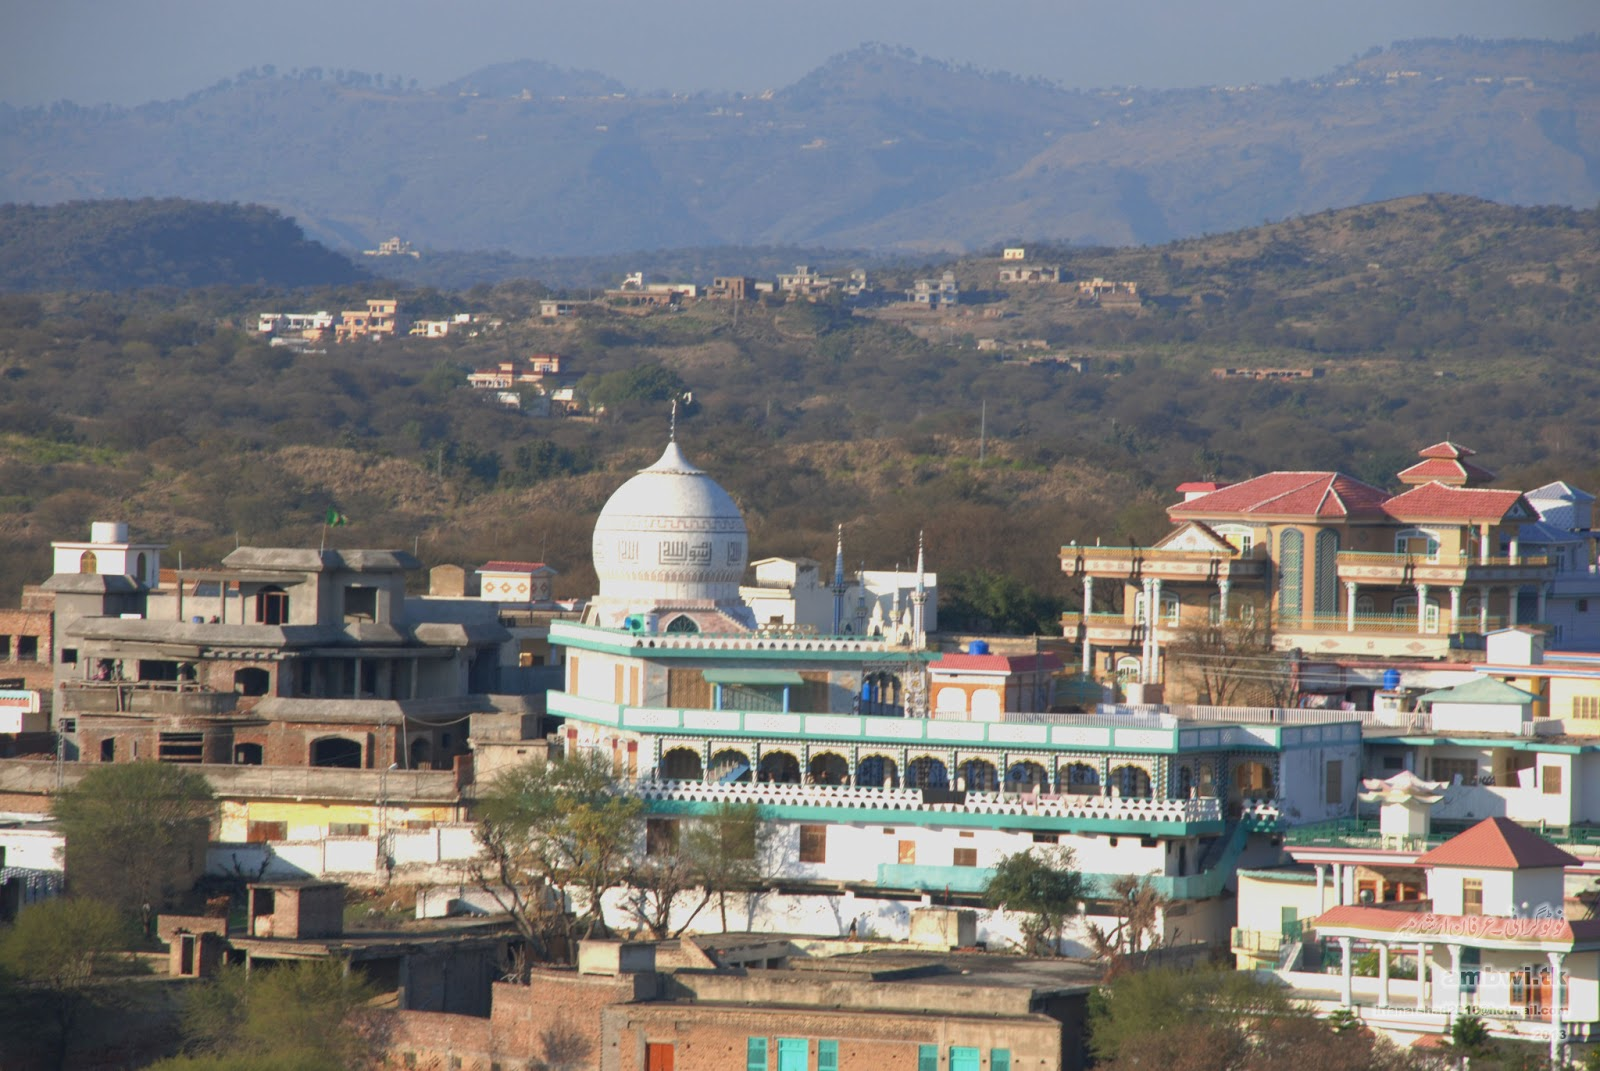 Islamabad-Taobutt-Neelum Valley Tour - Keran, Azad Kashmir Mirpur azad kashmir houses pictures